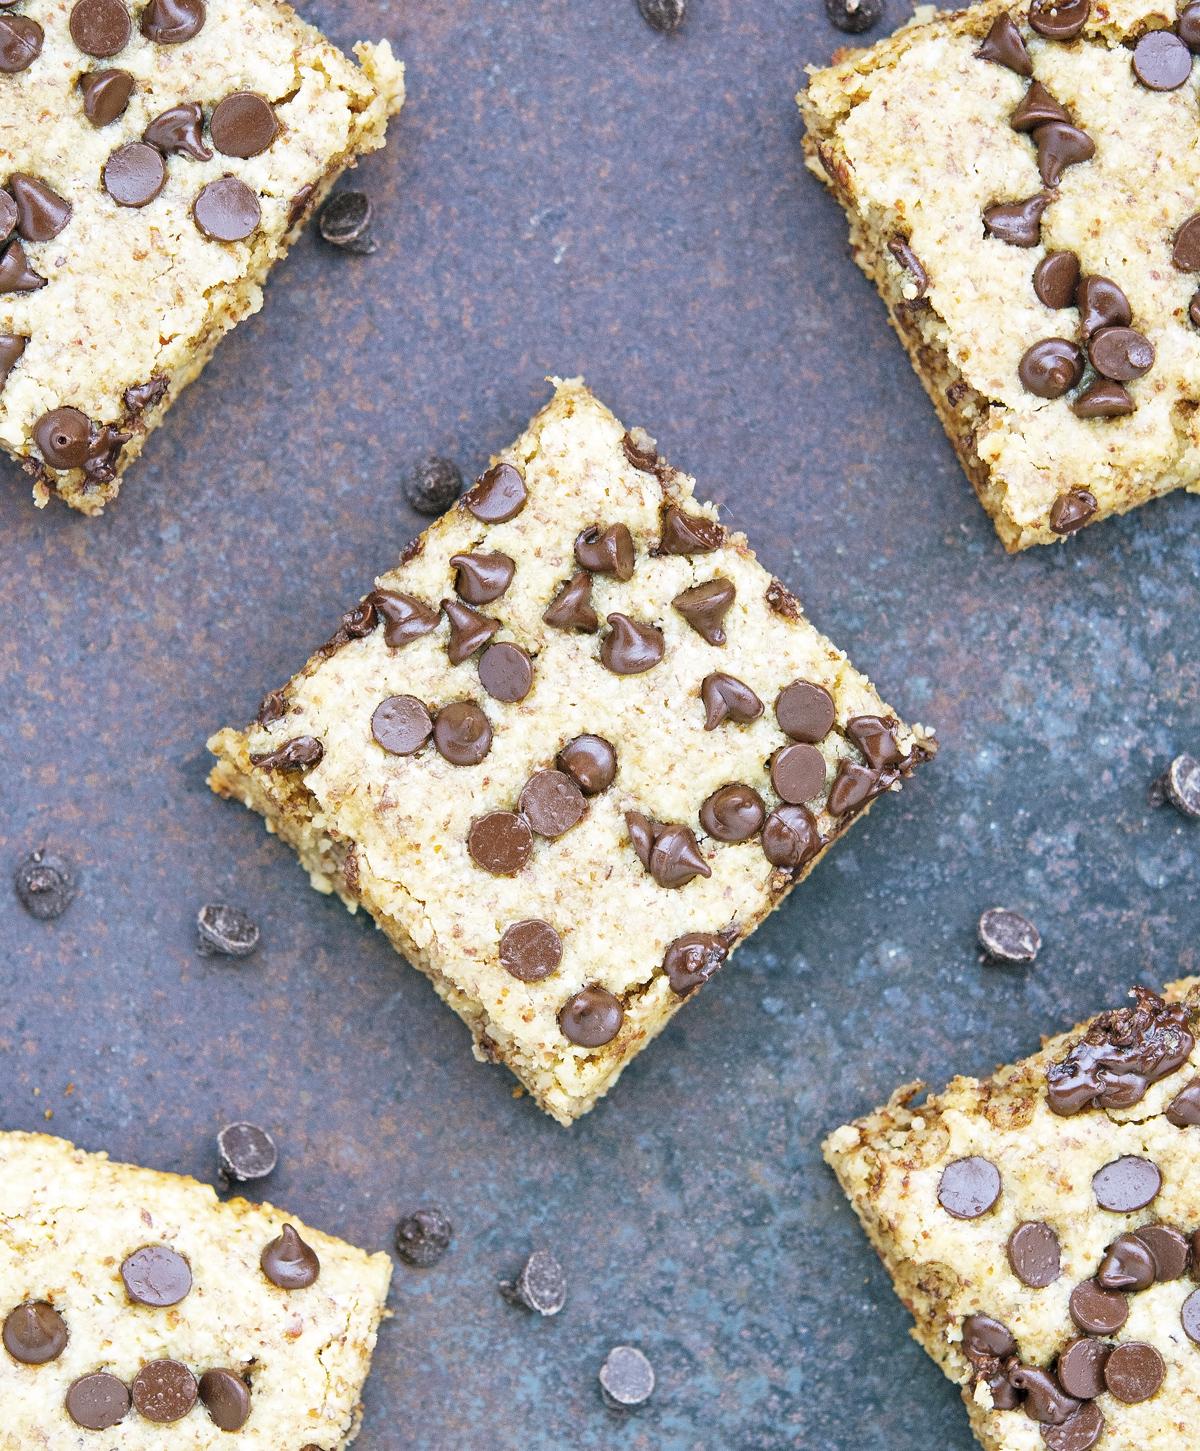 (Paleo) Chocolate Chip Cookie Squares